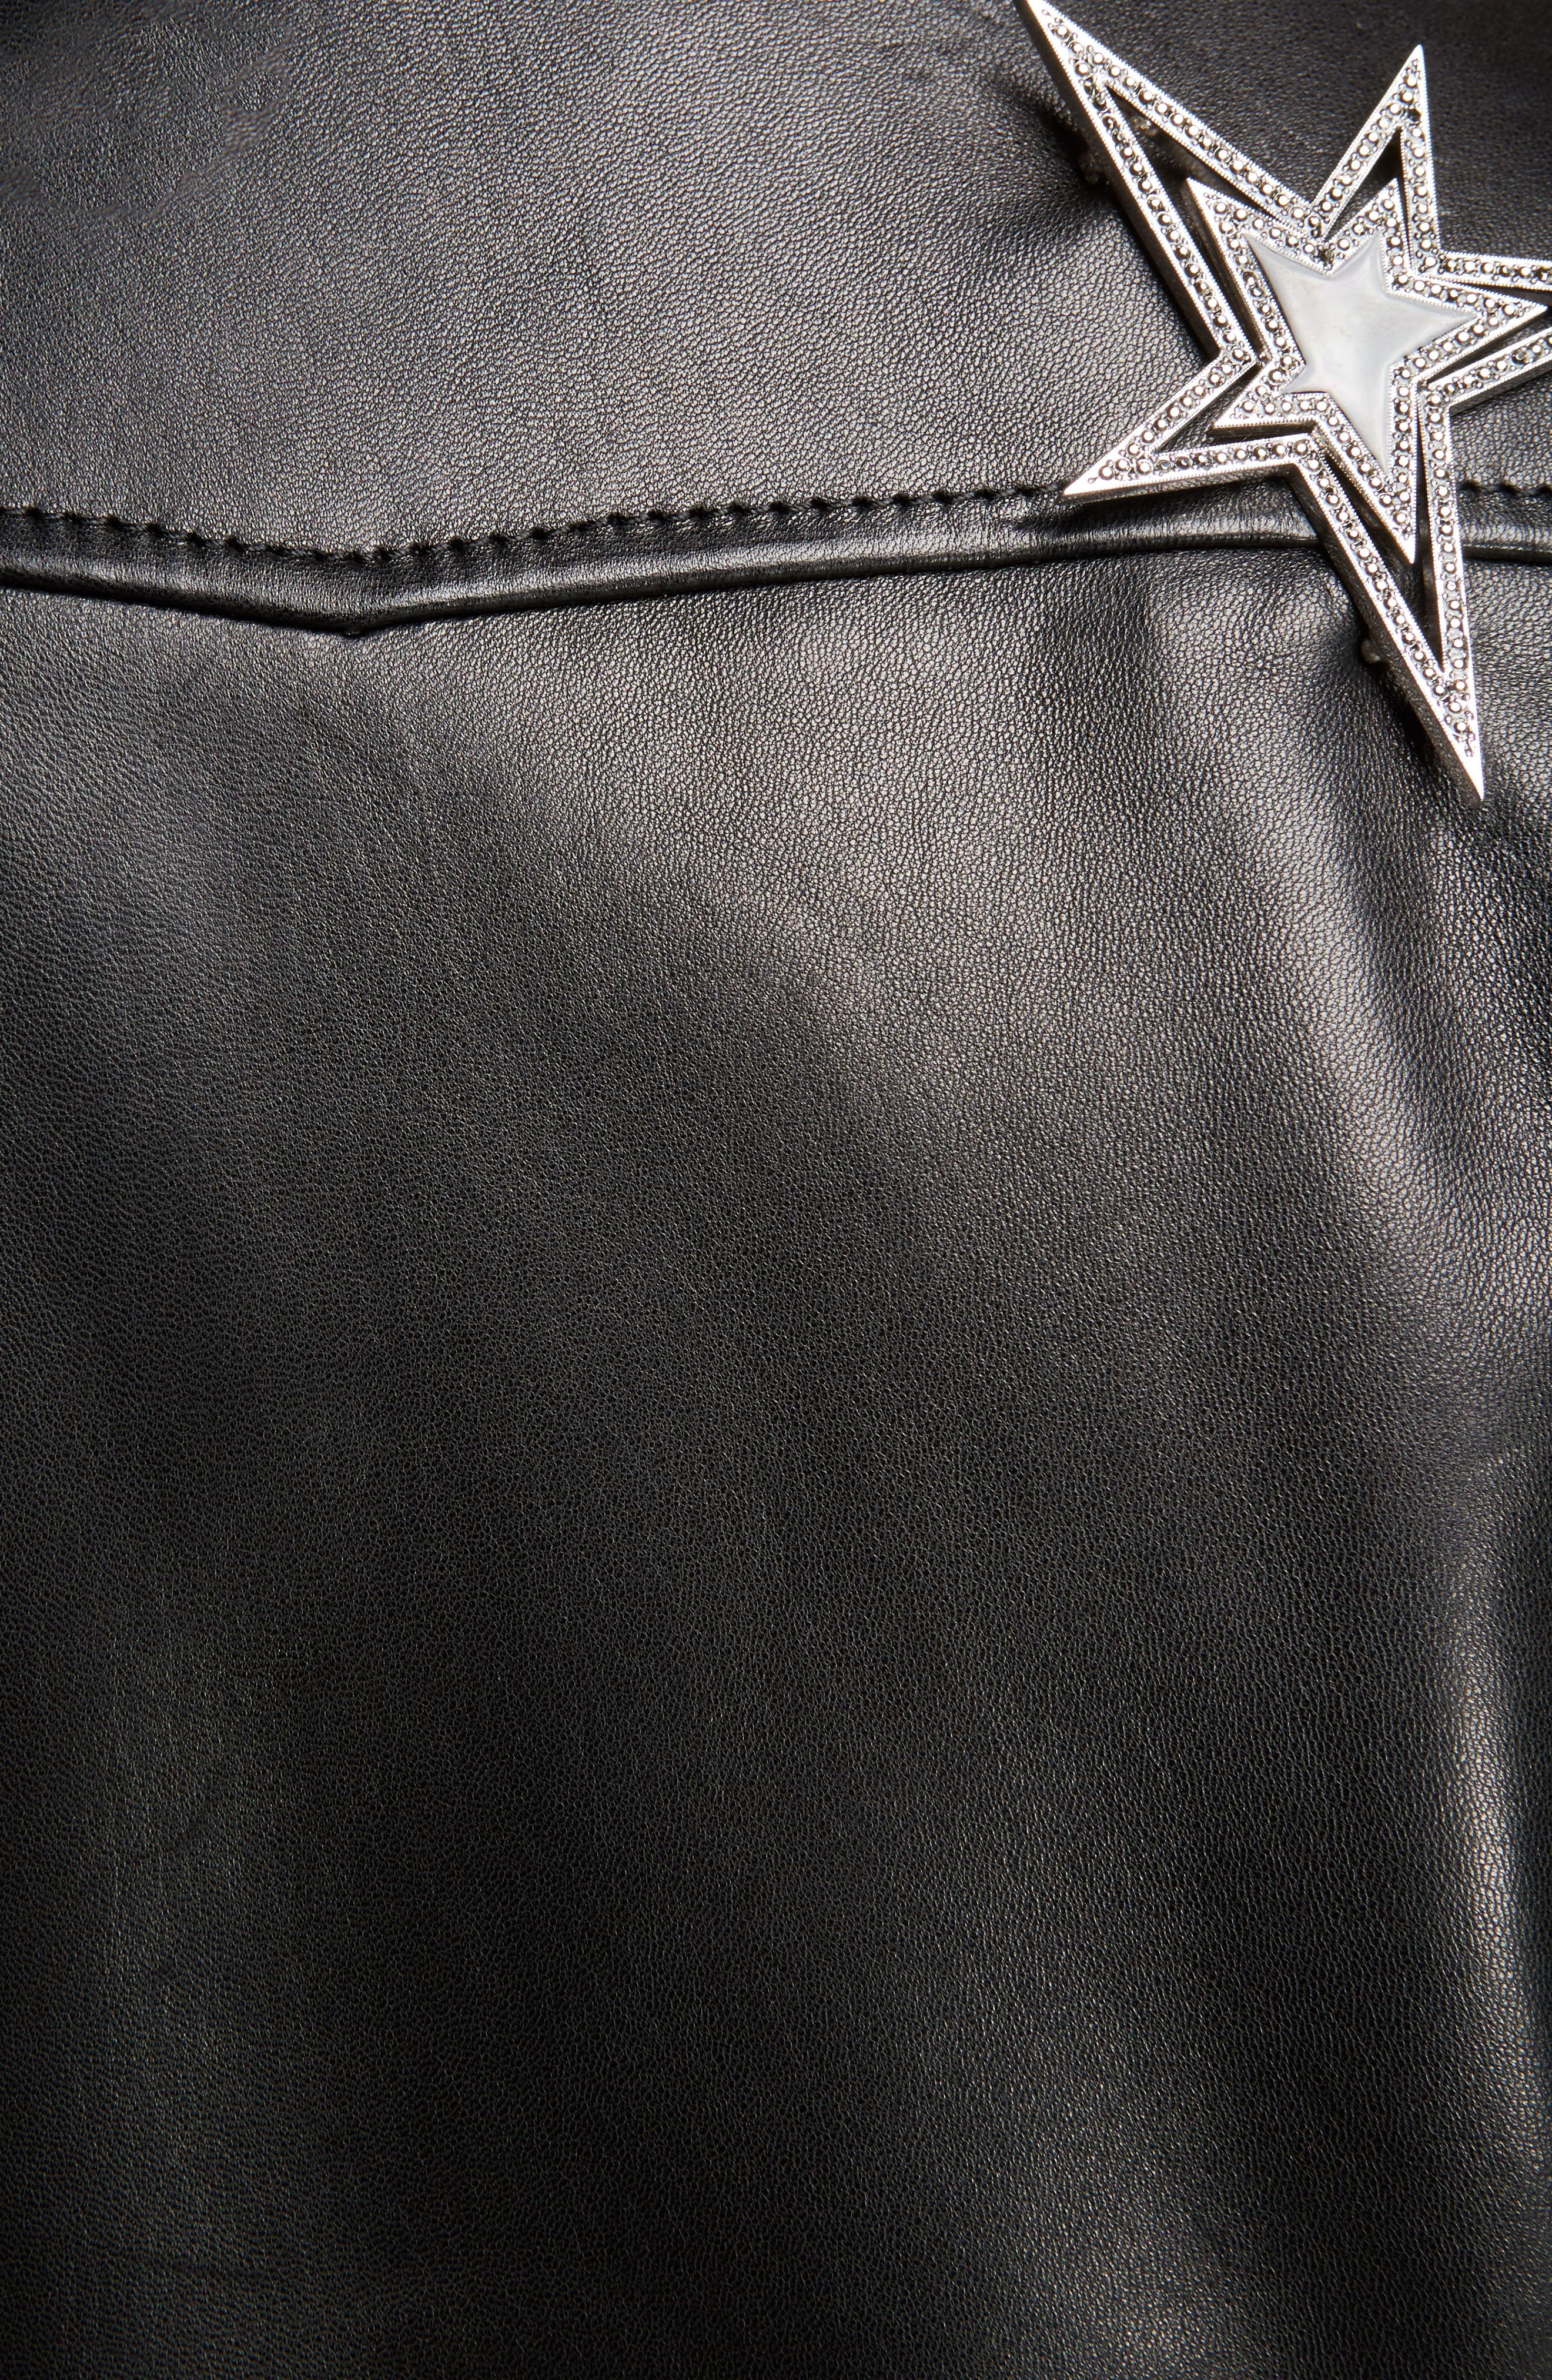 Alternate Image 3  - Saint Laurent YSL Logo Classic Leather Moto Jacket